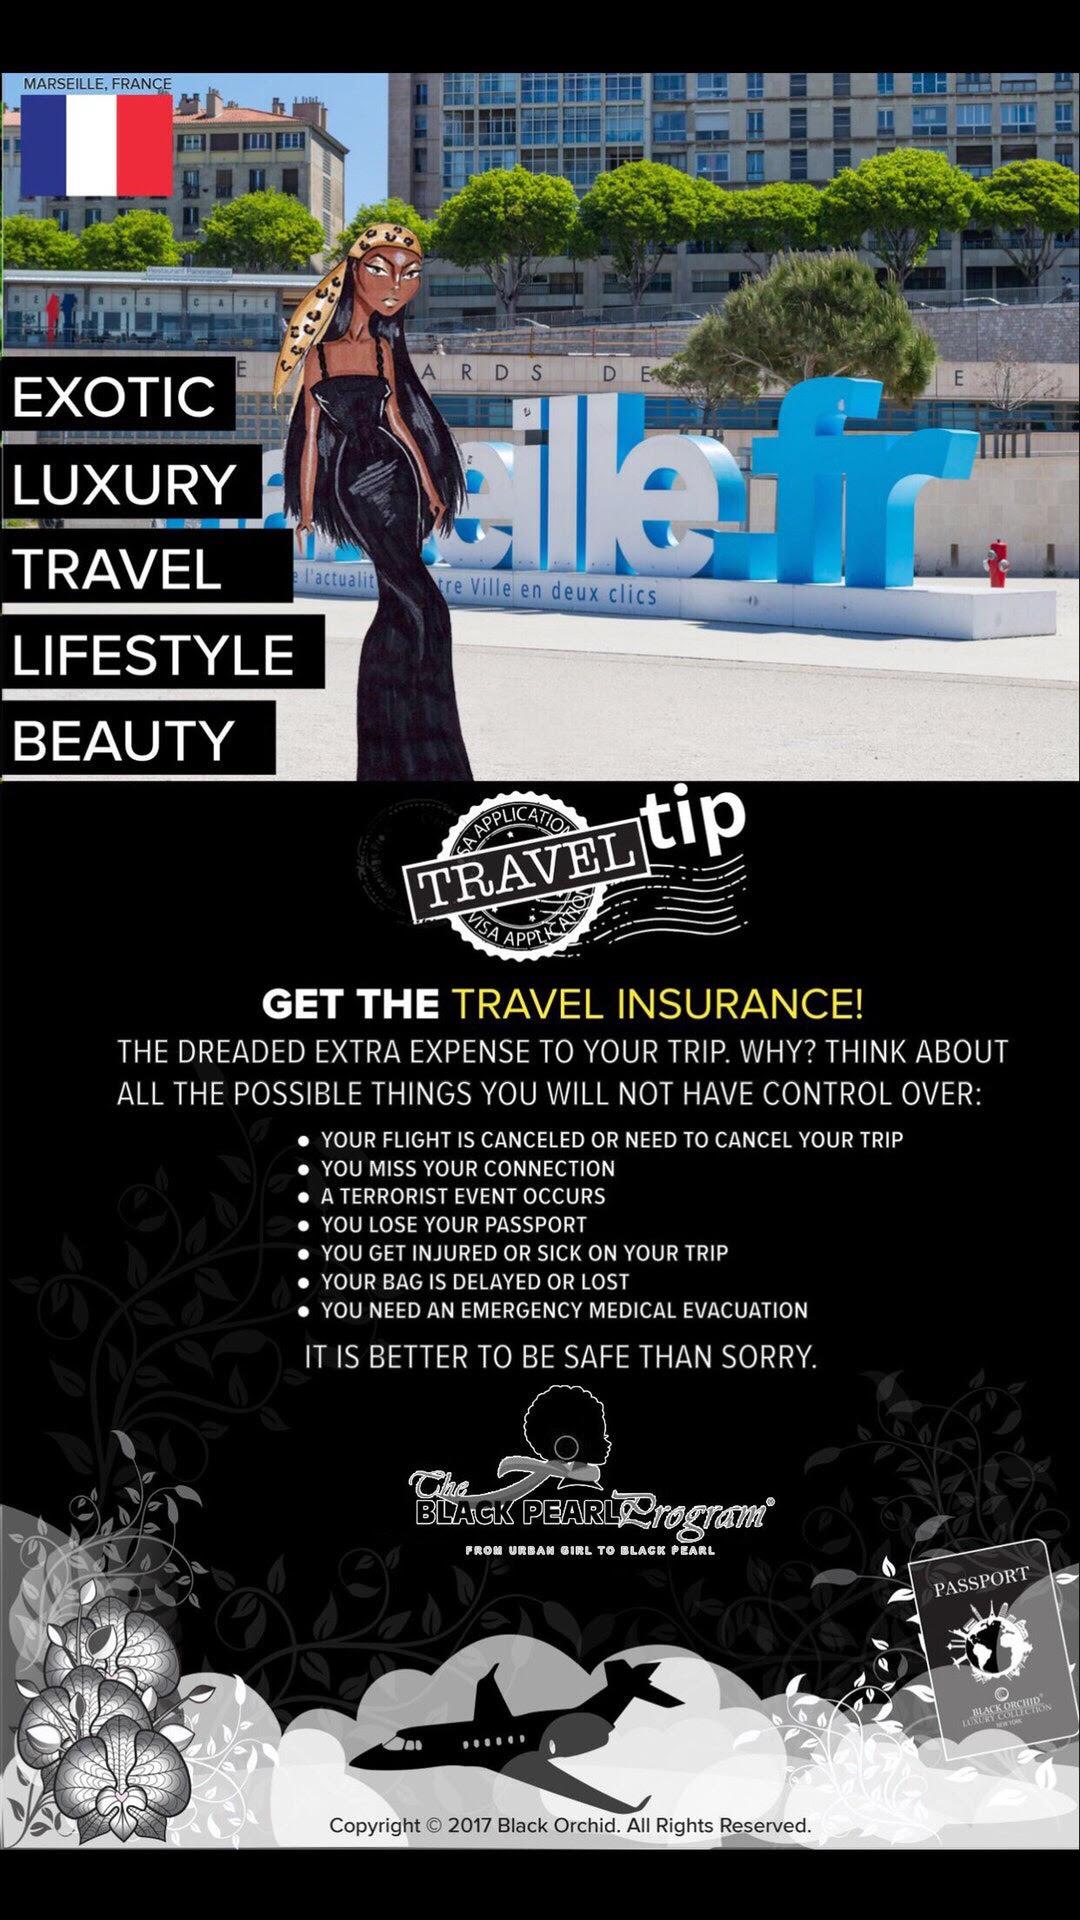 Travel Tip #7